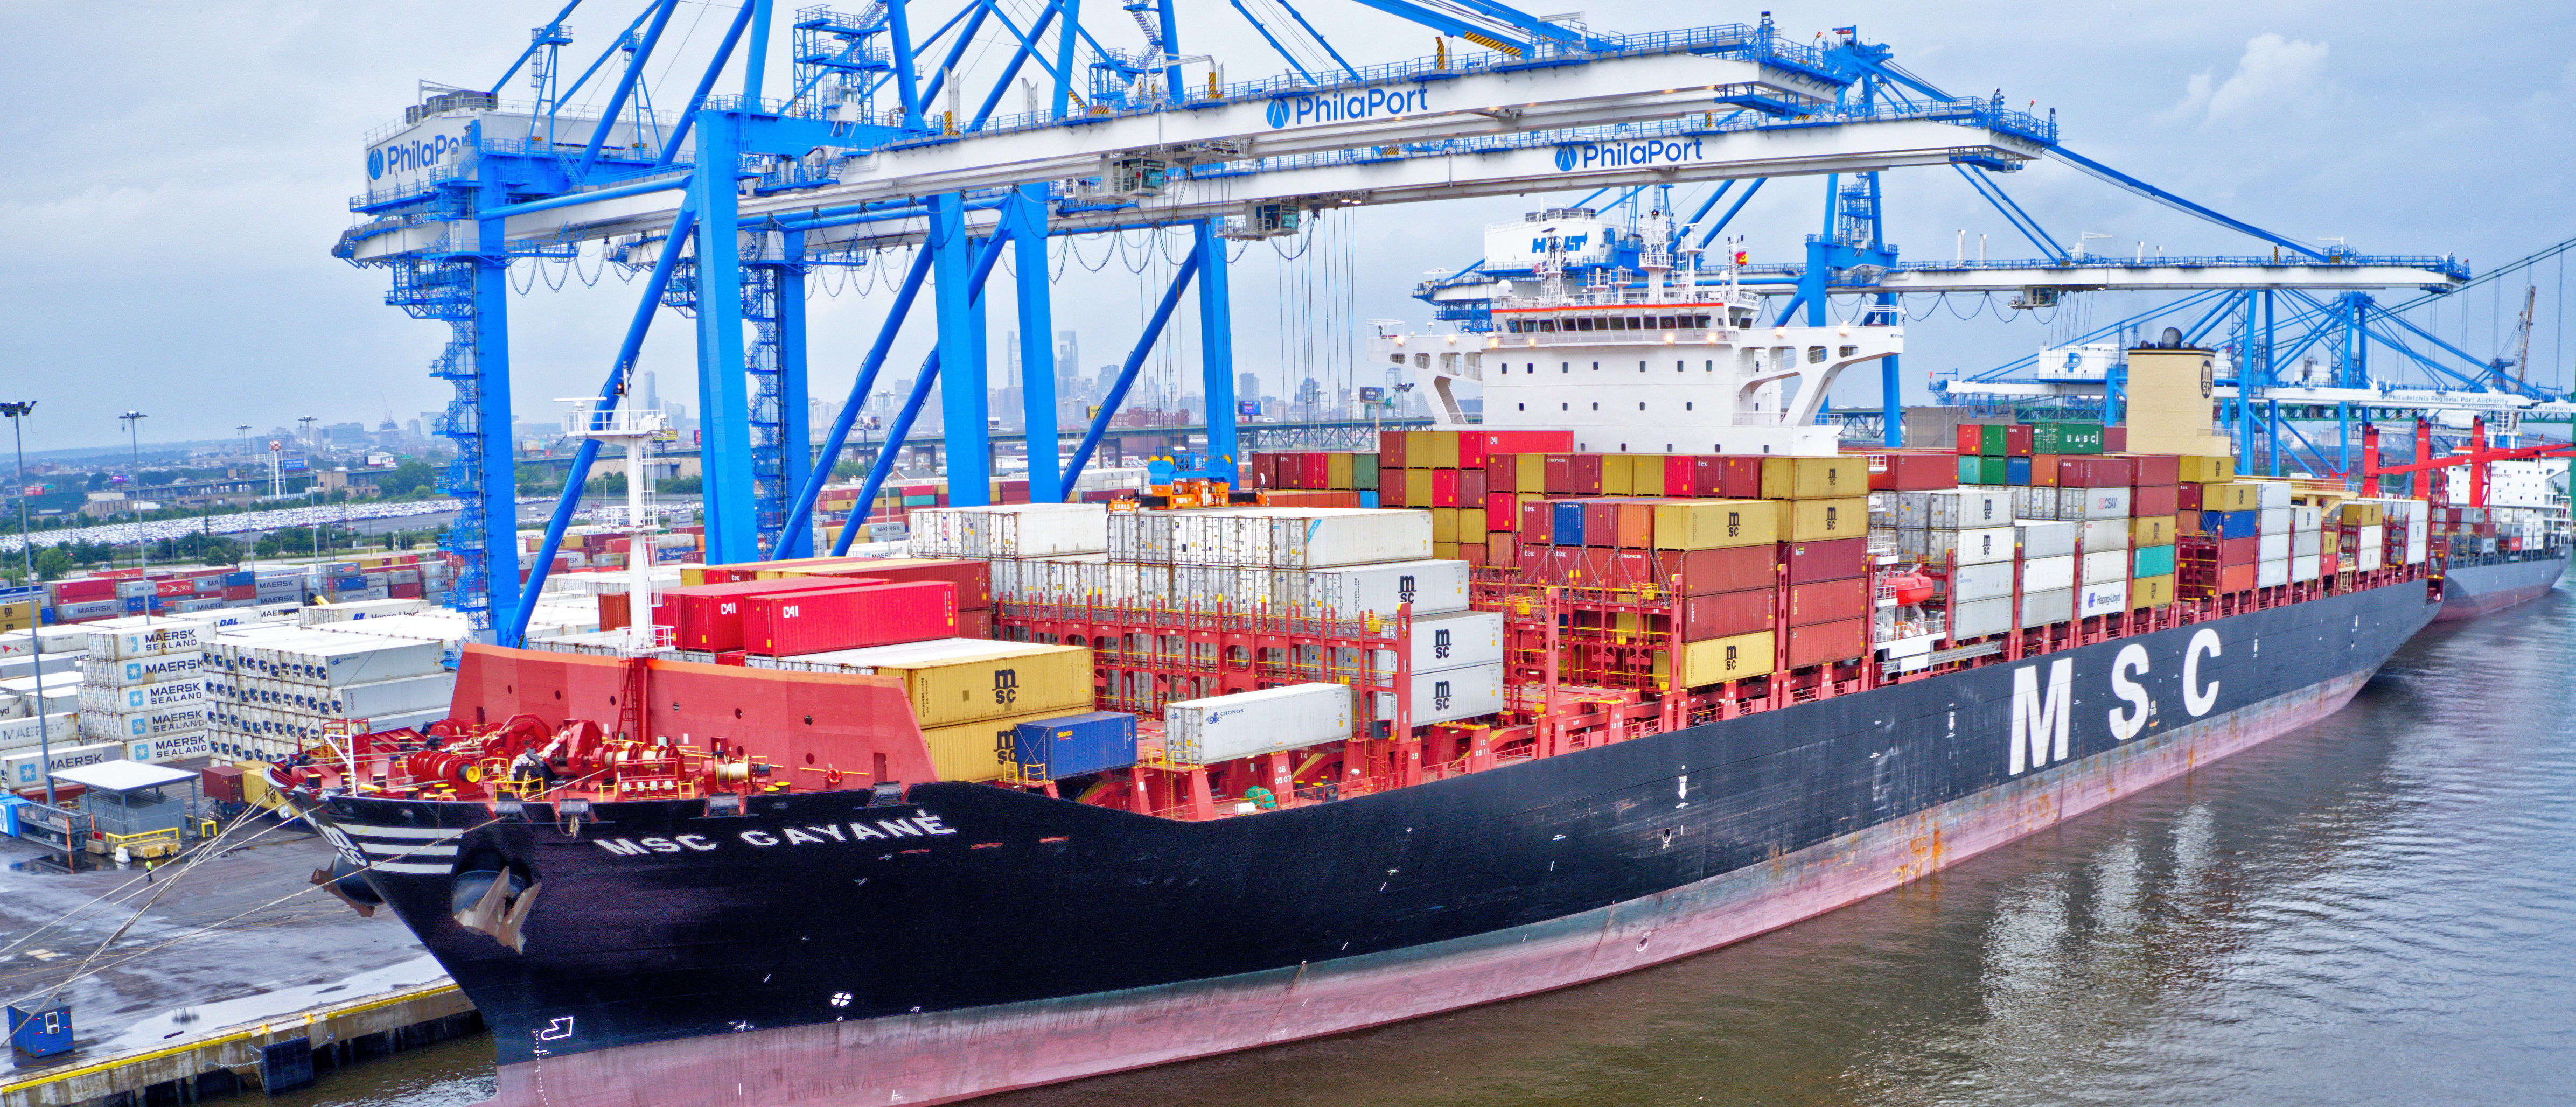 Philadelphia, PA / USA - June 18, 2019: 16.5 tons of cocaine worth $1 billion seized at Philadelphia port Cargo Ship MSC Gaynes Credit: Shutterstock